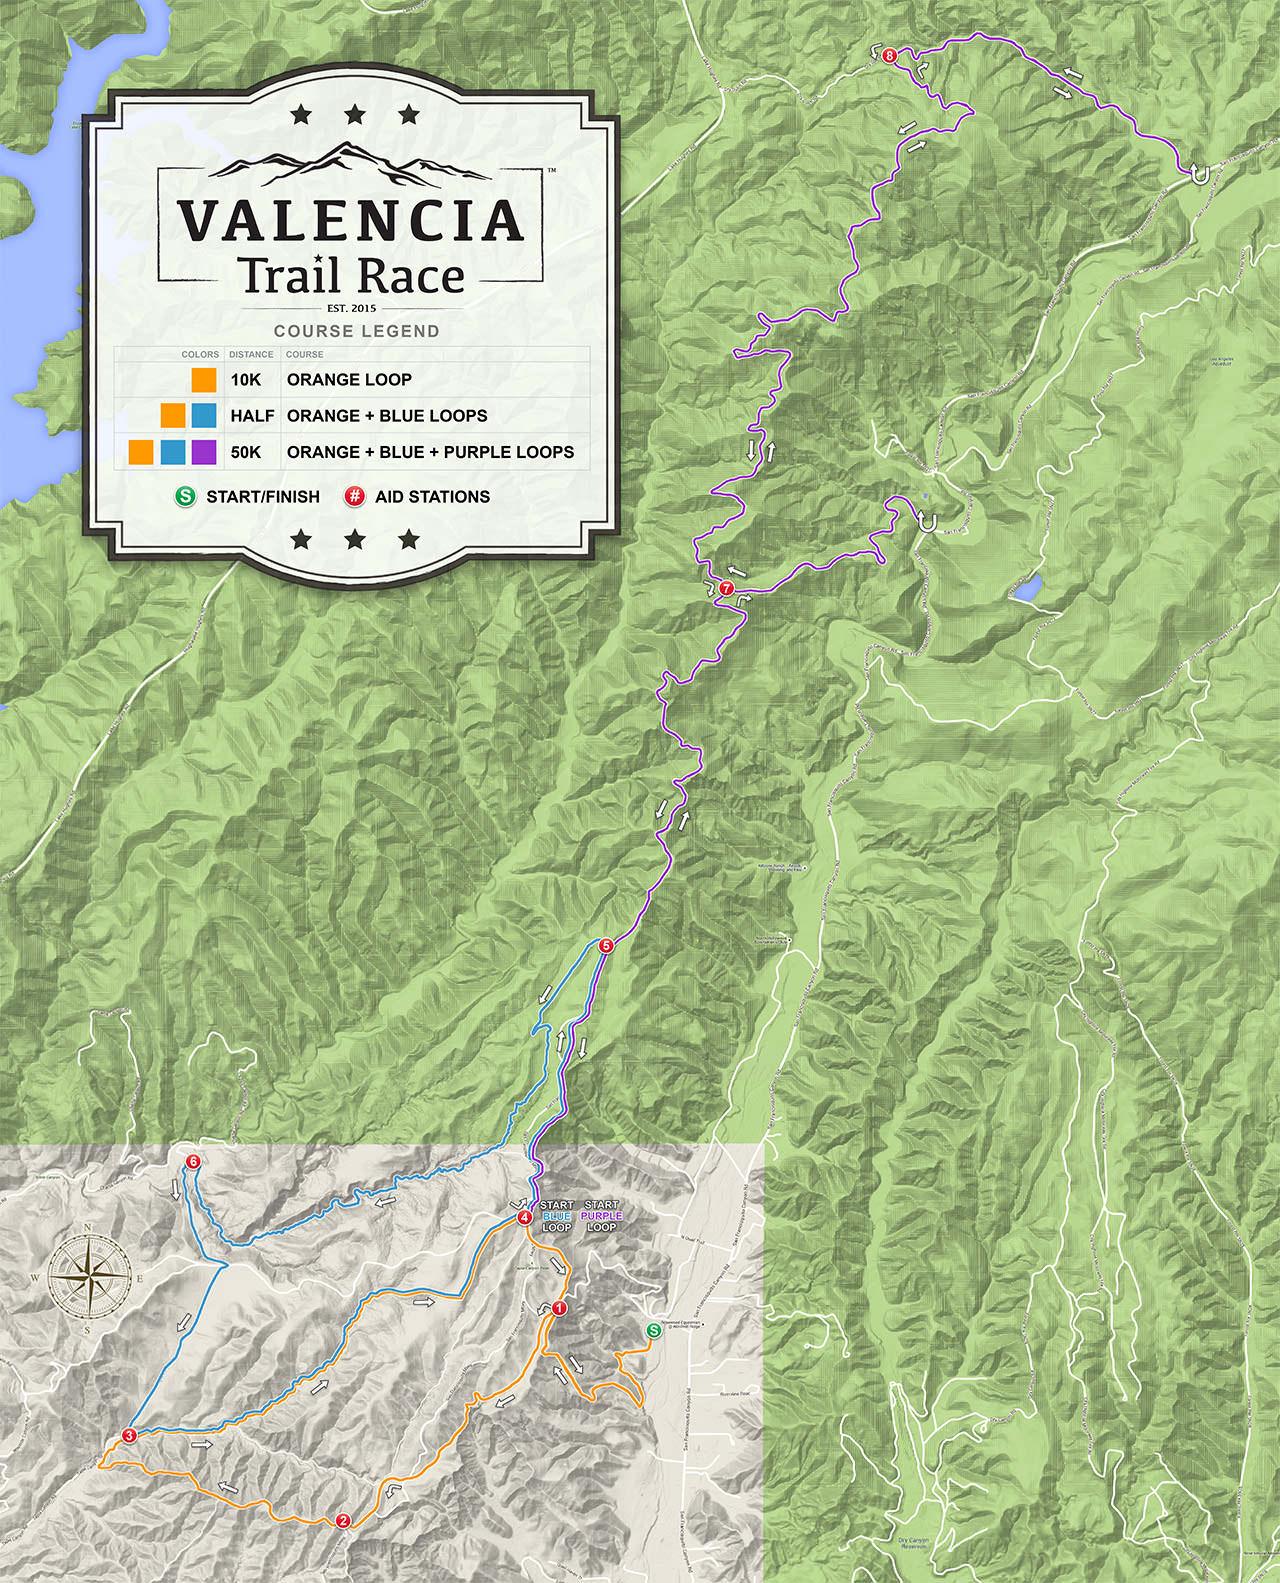 VALENCIA Trail Race - 50K Course